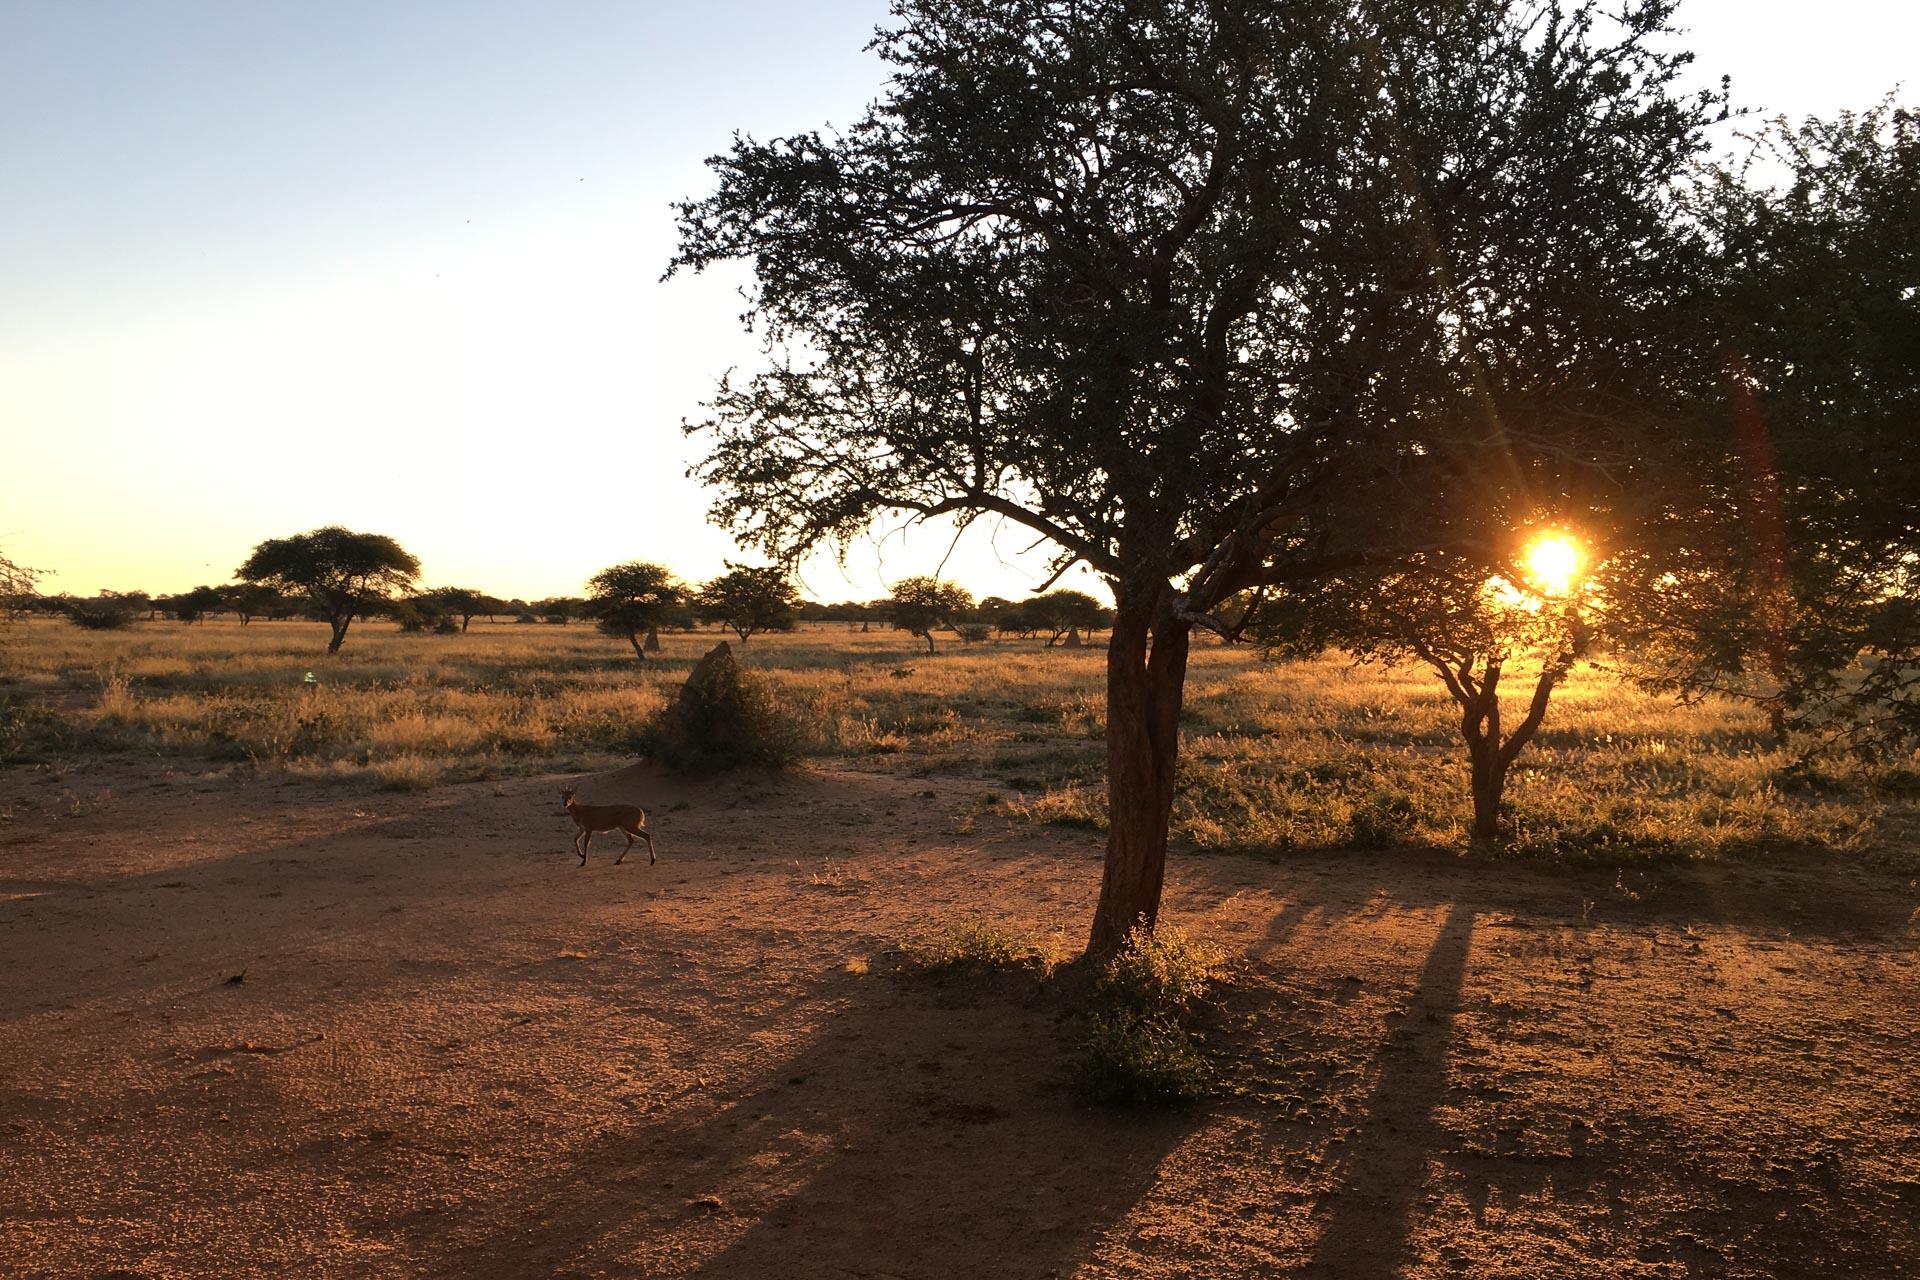 Okonjima-Namibia-Globetrotter-Select-2